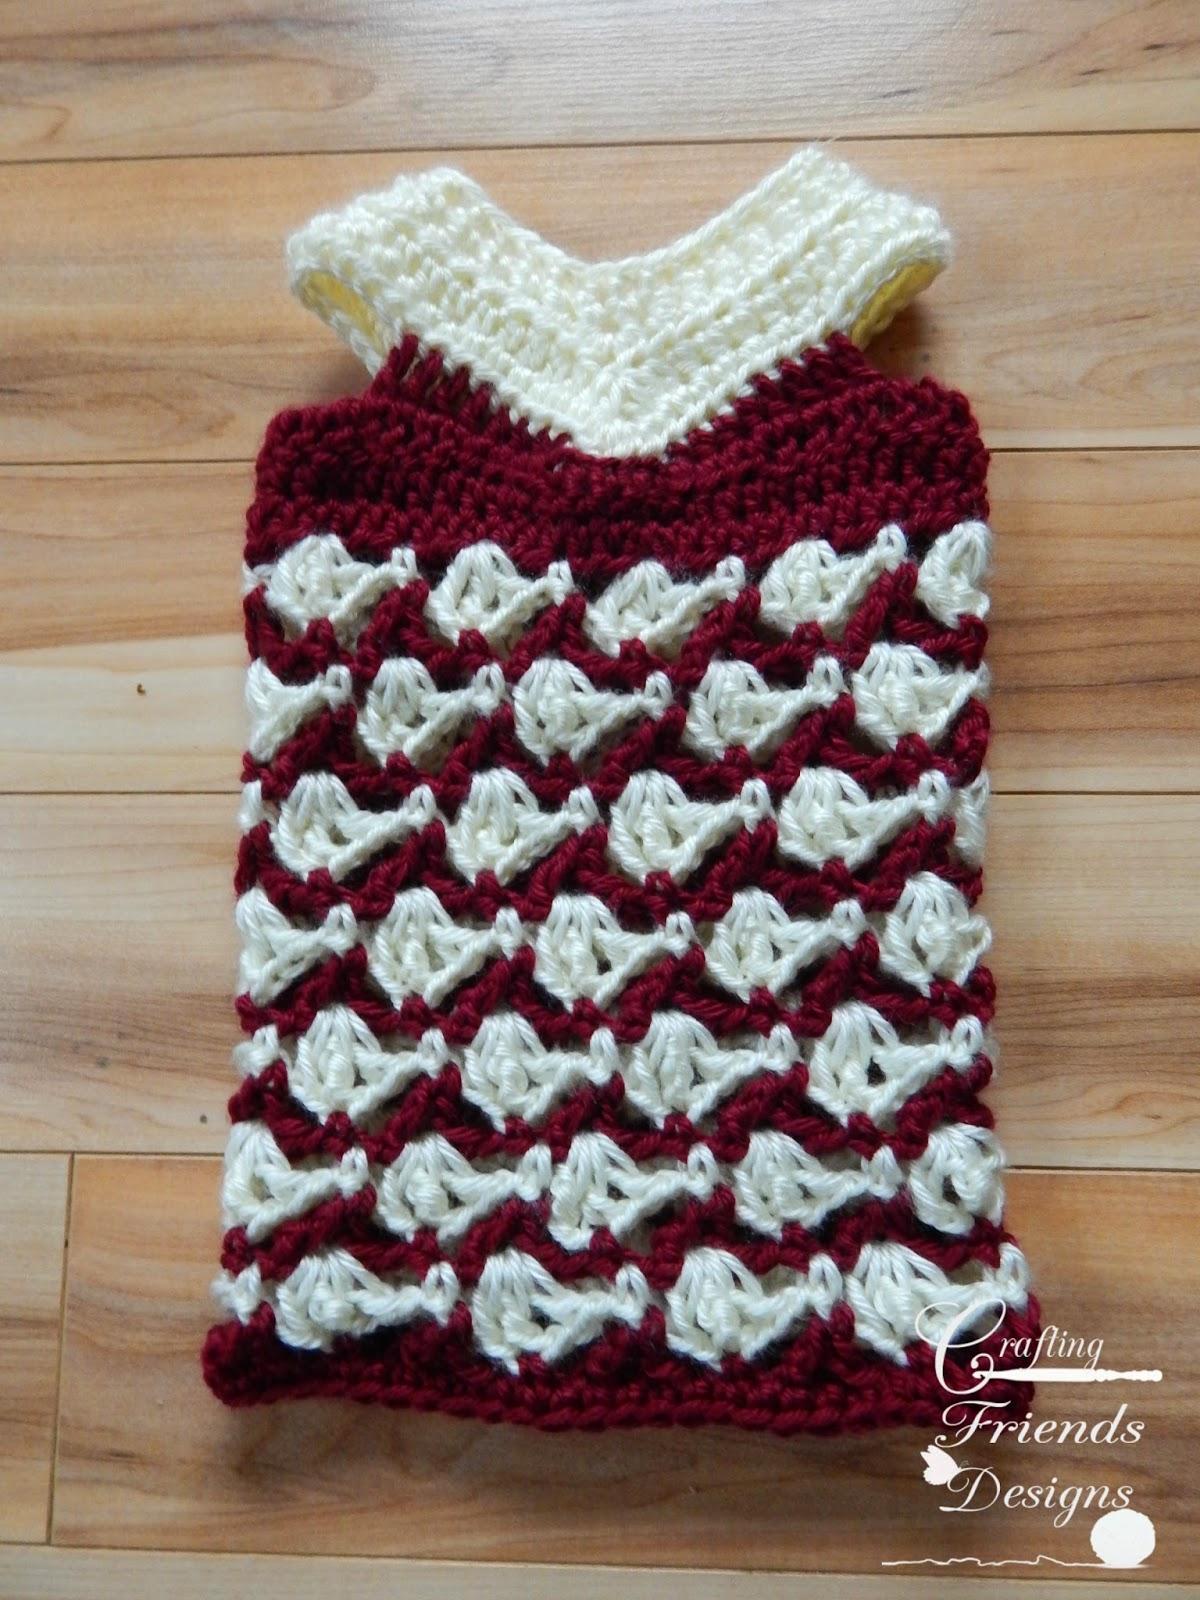 With All My Heart Dress crochet pattern